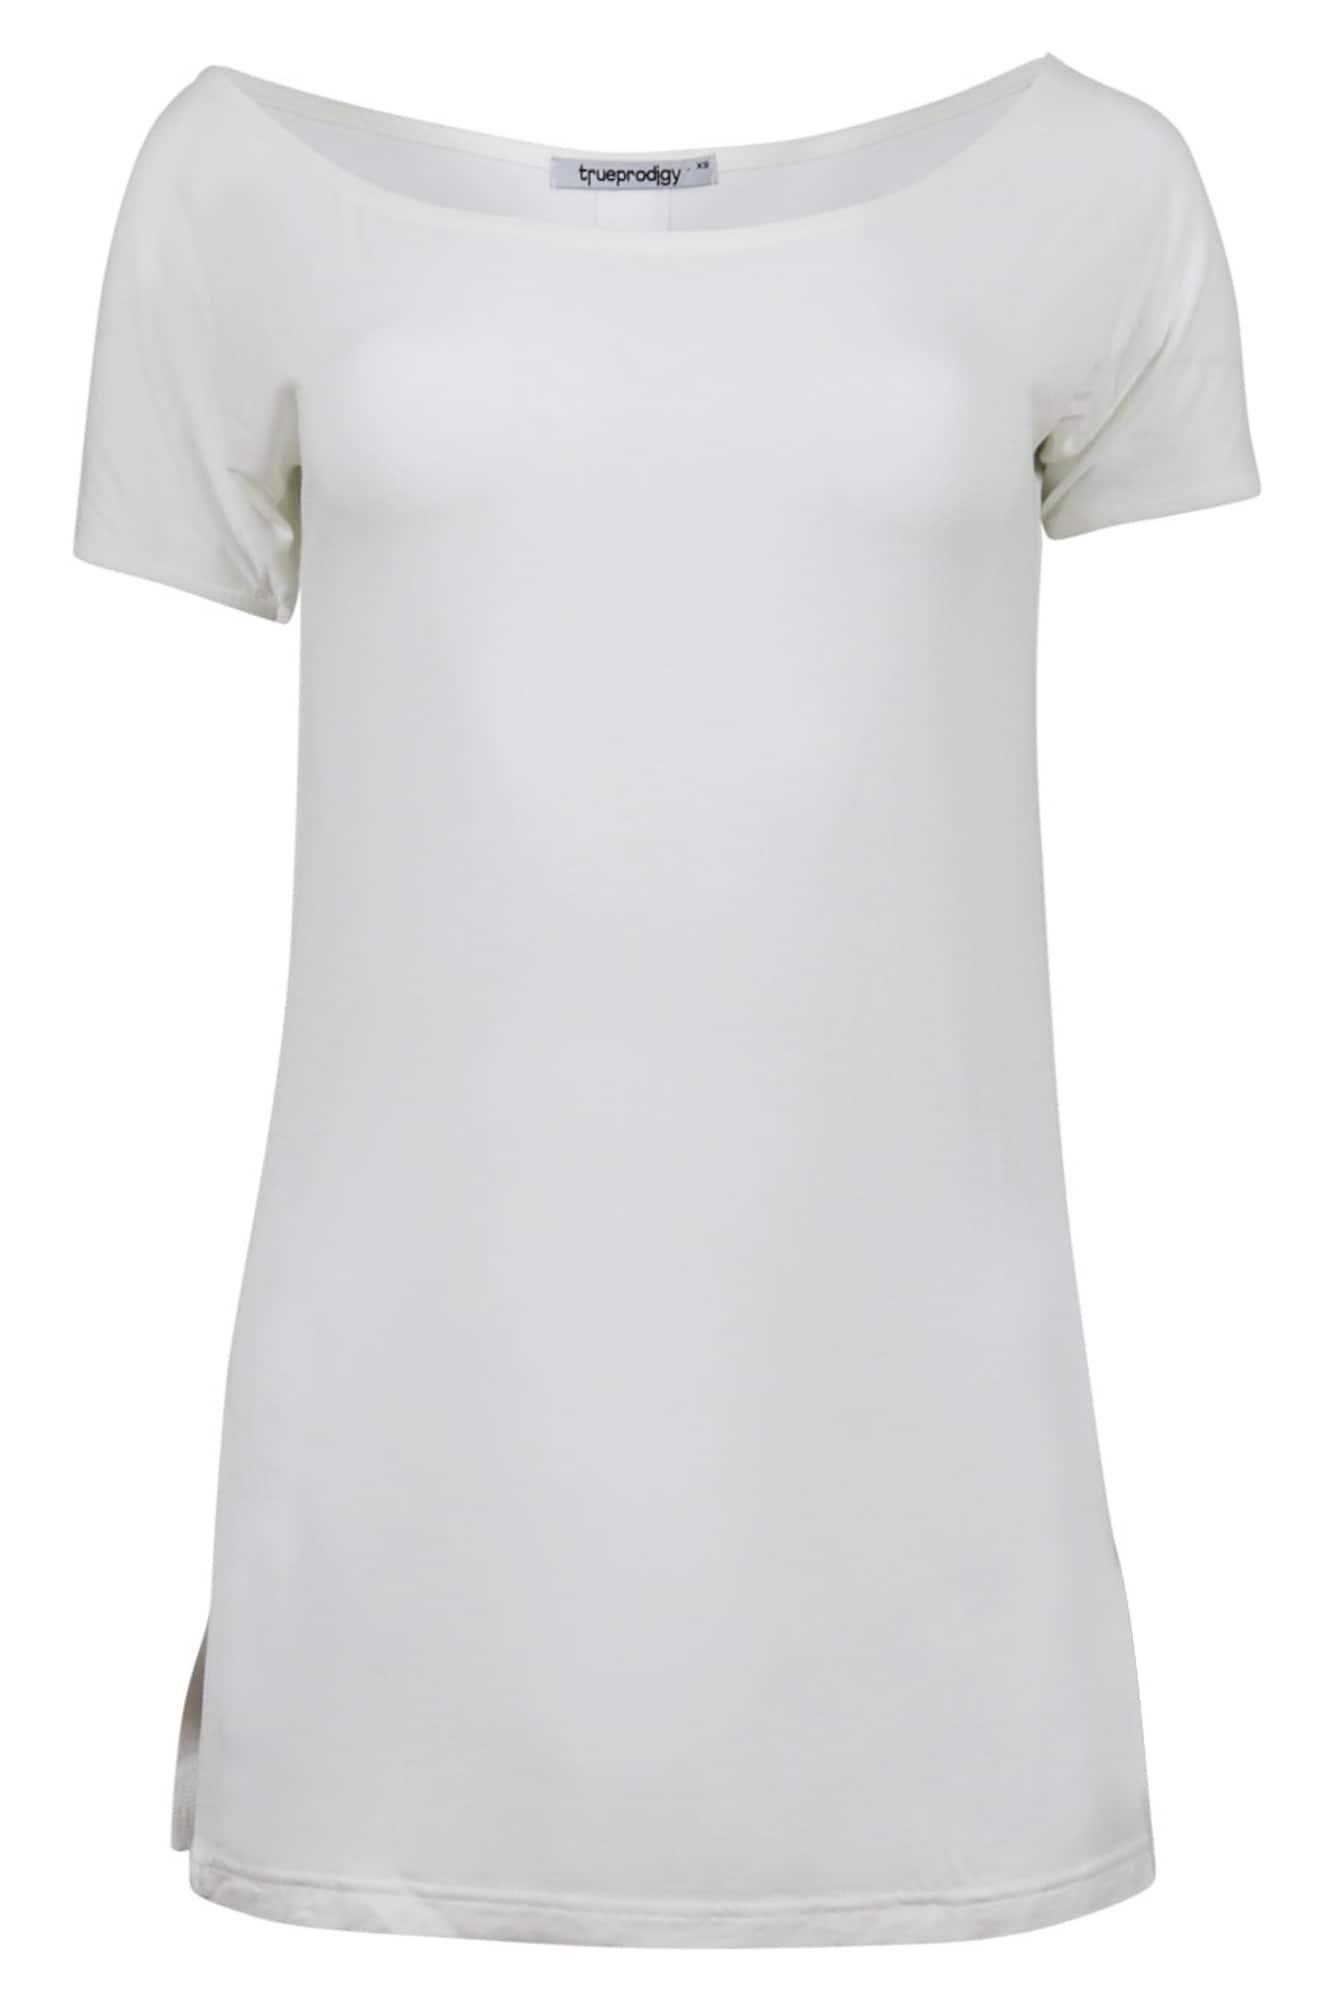 Longshirt 'Naira'   Bekleidung > Shirts > Longshirts   Trueprodigy